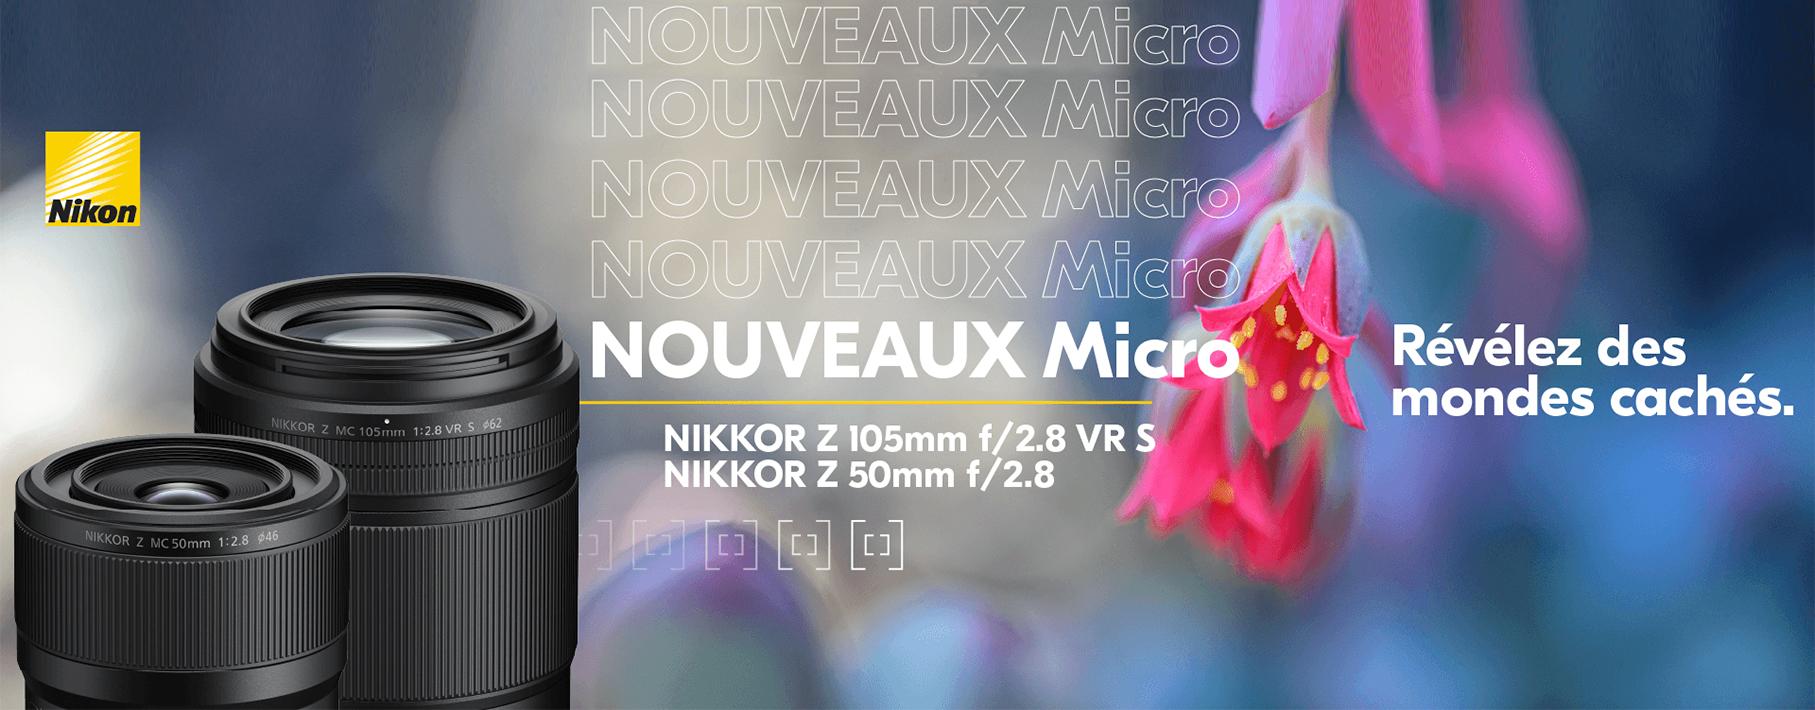 Nikon Micro